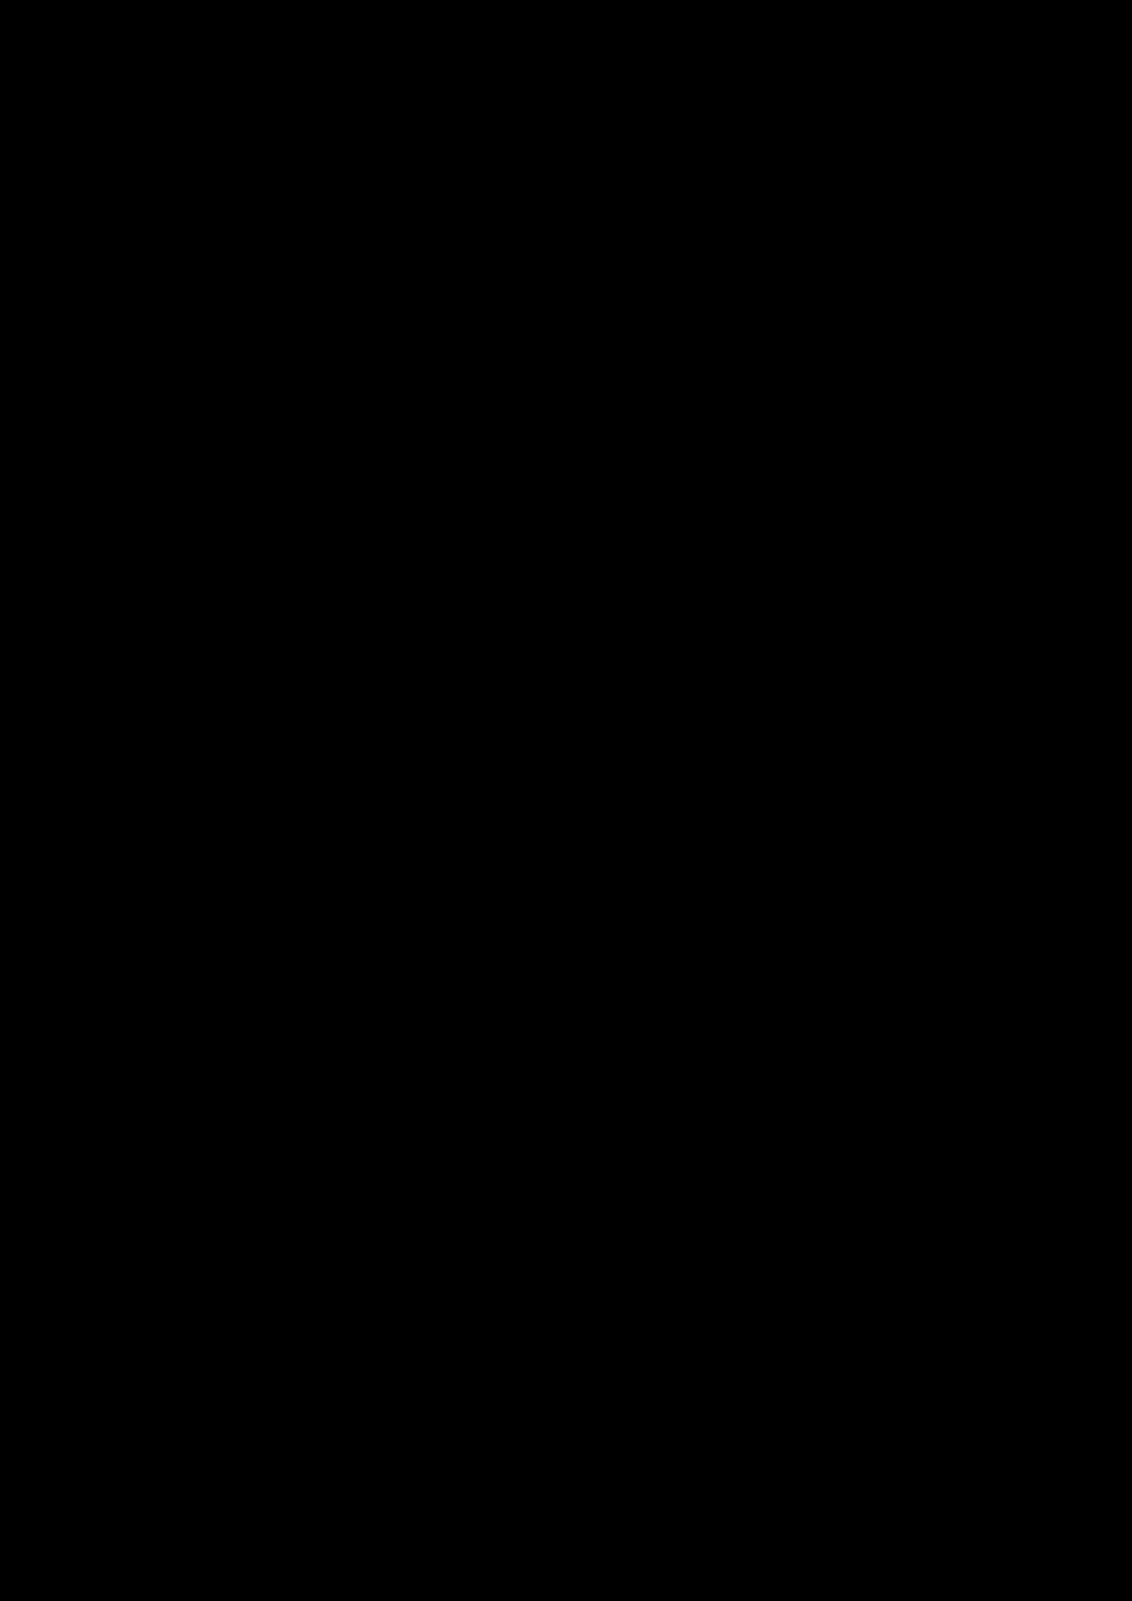 Prosti slide, Image 41